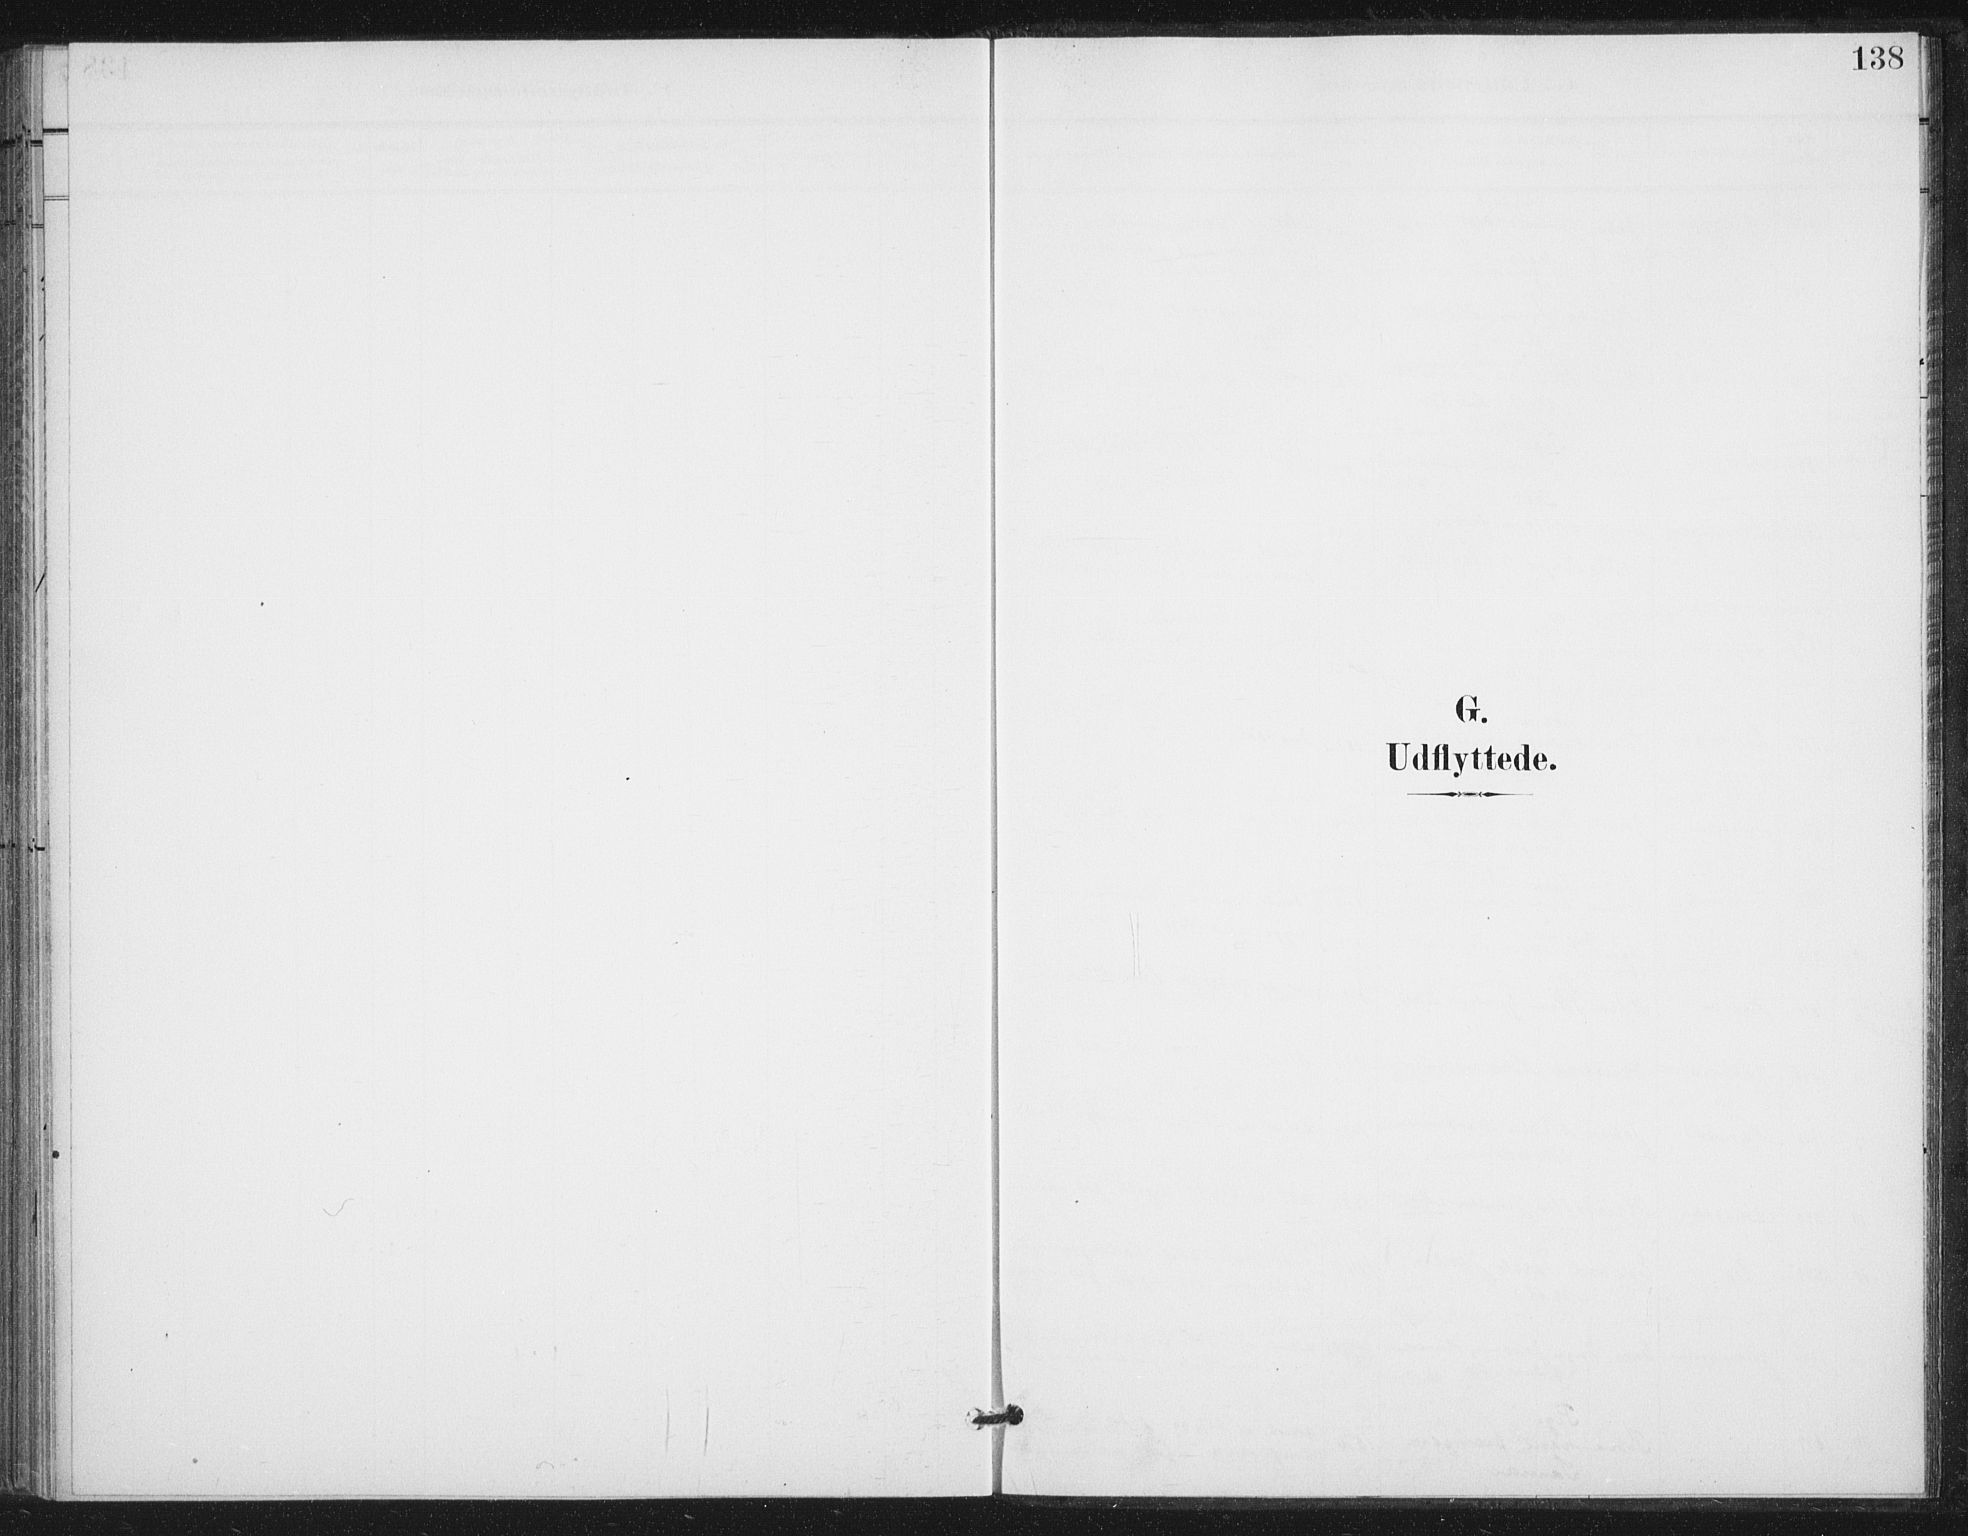 SAT, Ministerialprotokoller, klokkerbøker og fødselsregistre - Nordland, 894/L1356: Ministerialbok nr. 894A02, 1897-1914, s. 138